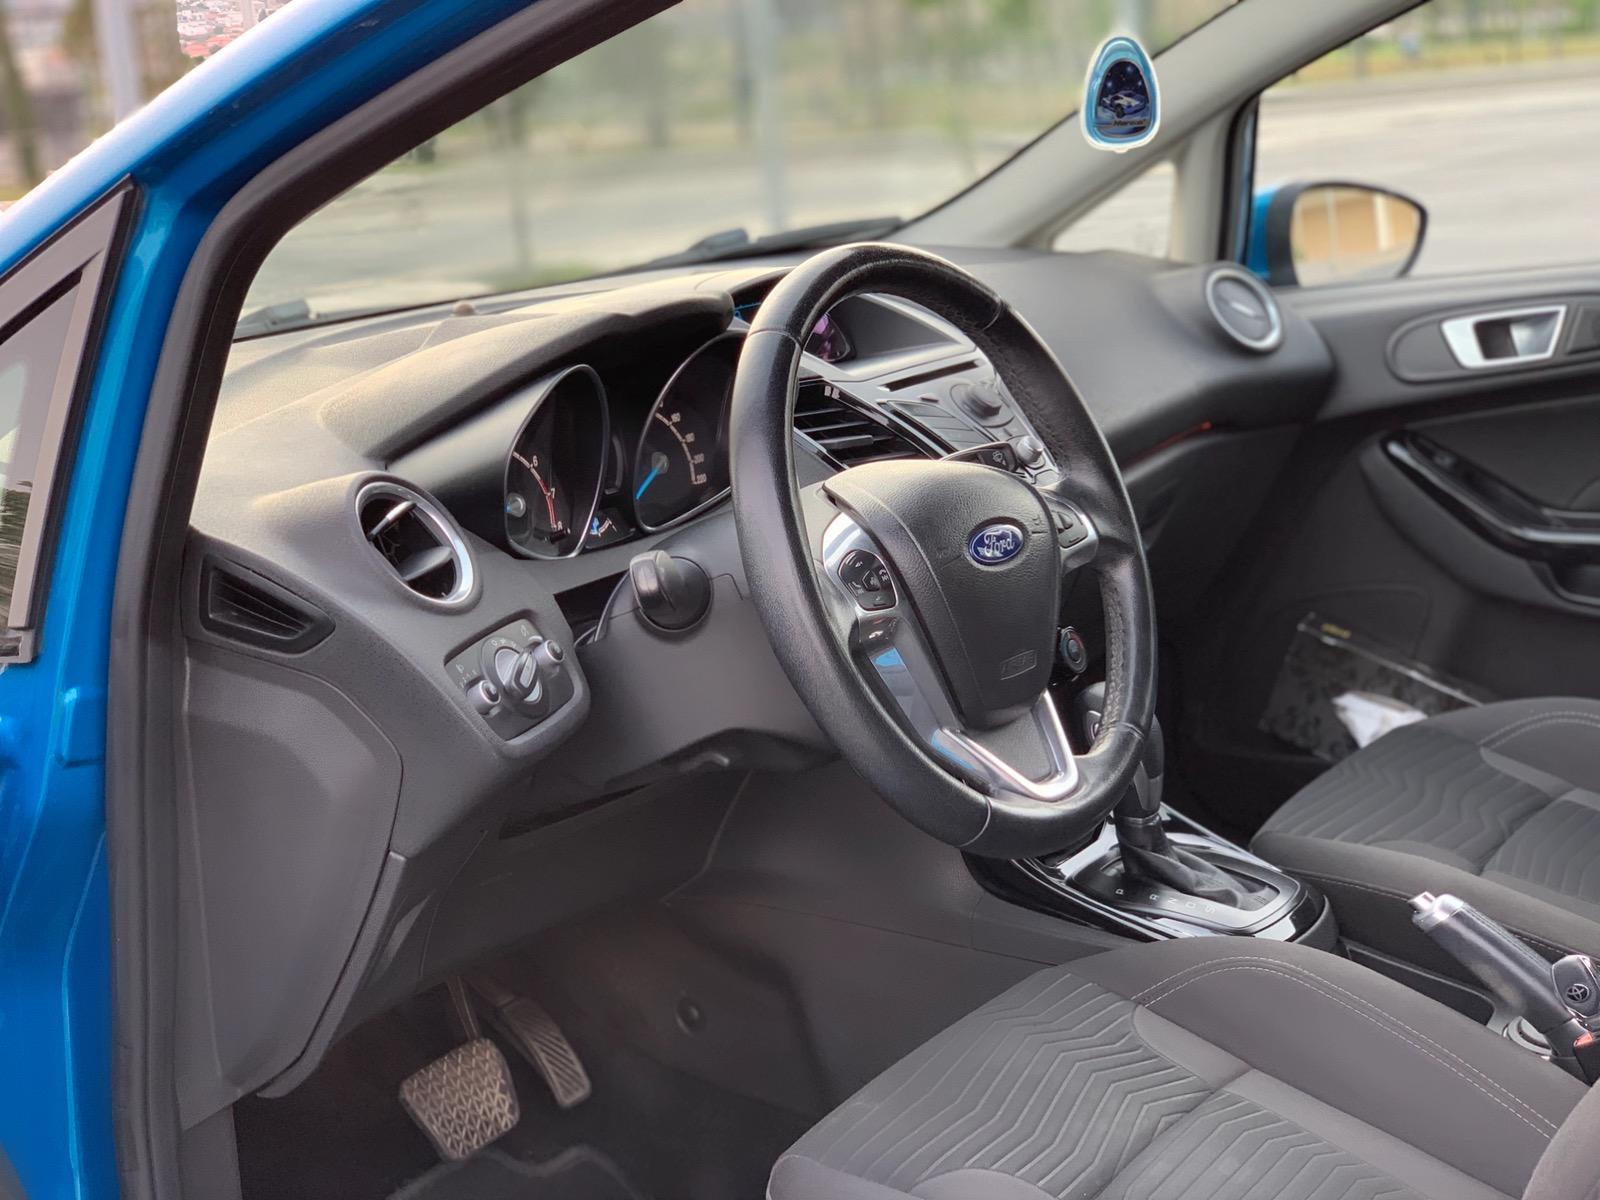 Ford Fiesta 1.6(lt) 2013 Подержанный  $14500